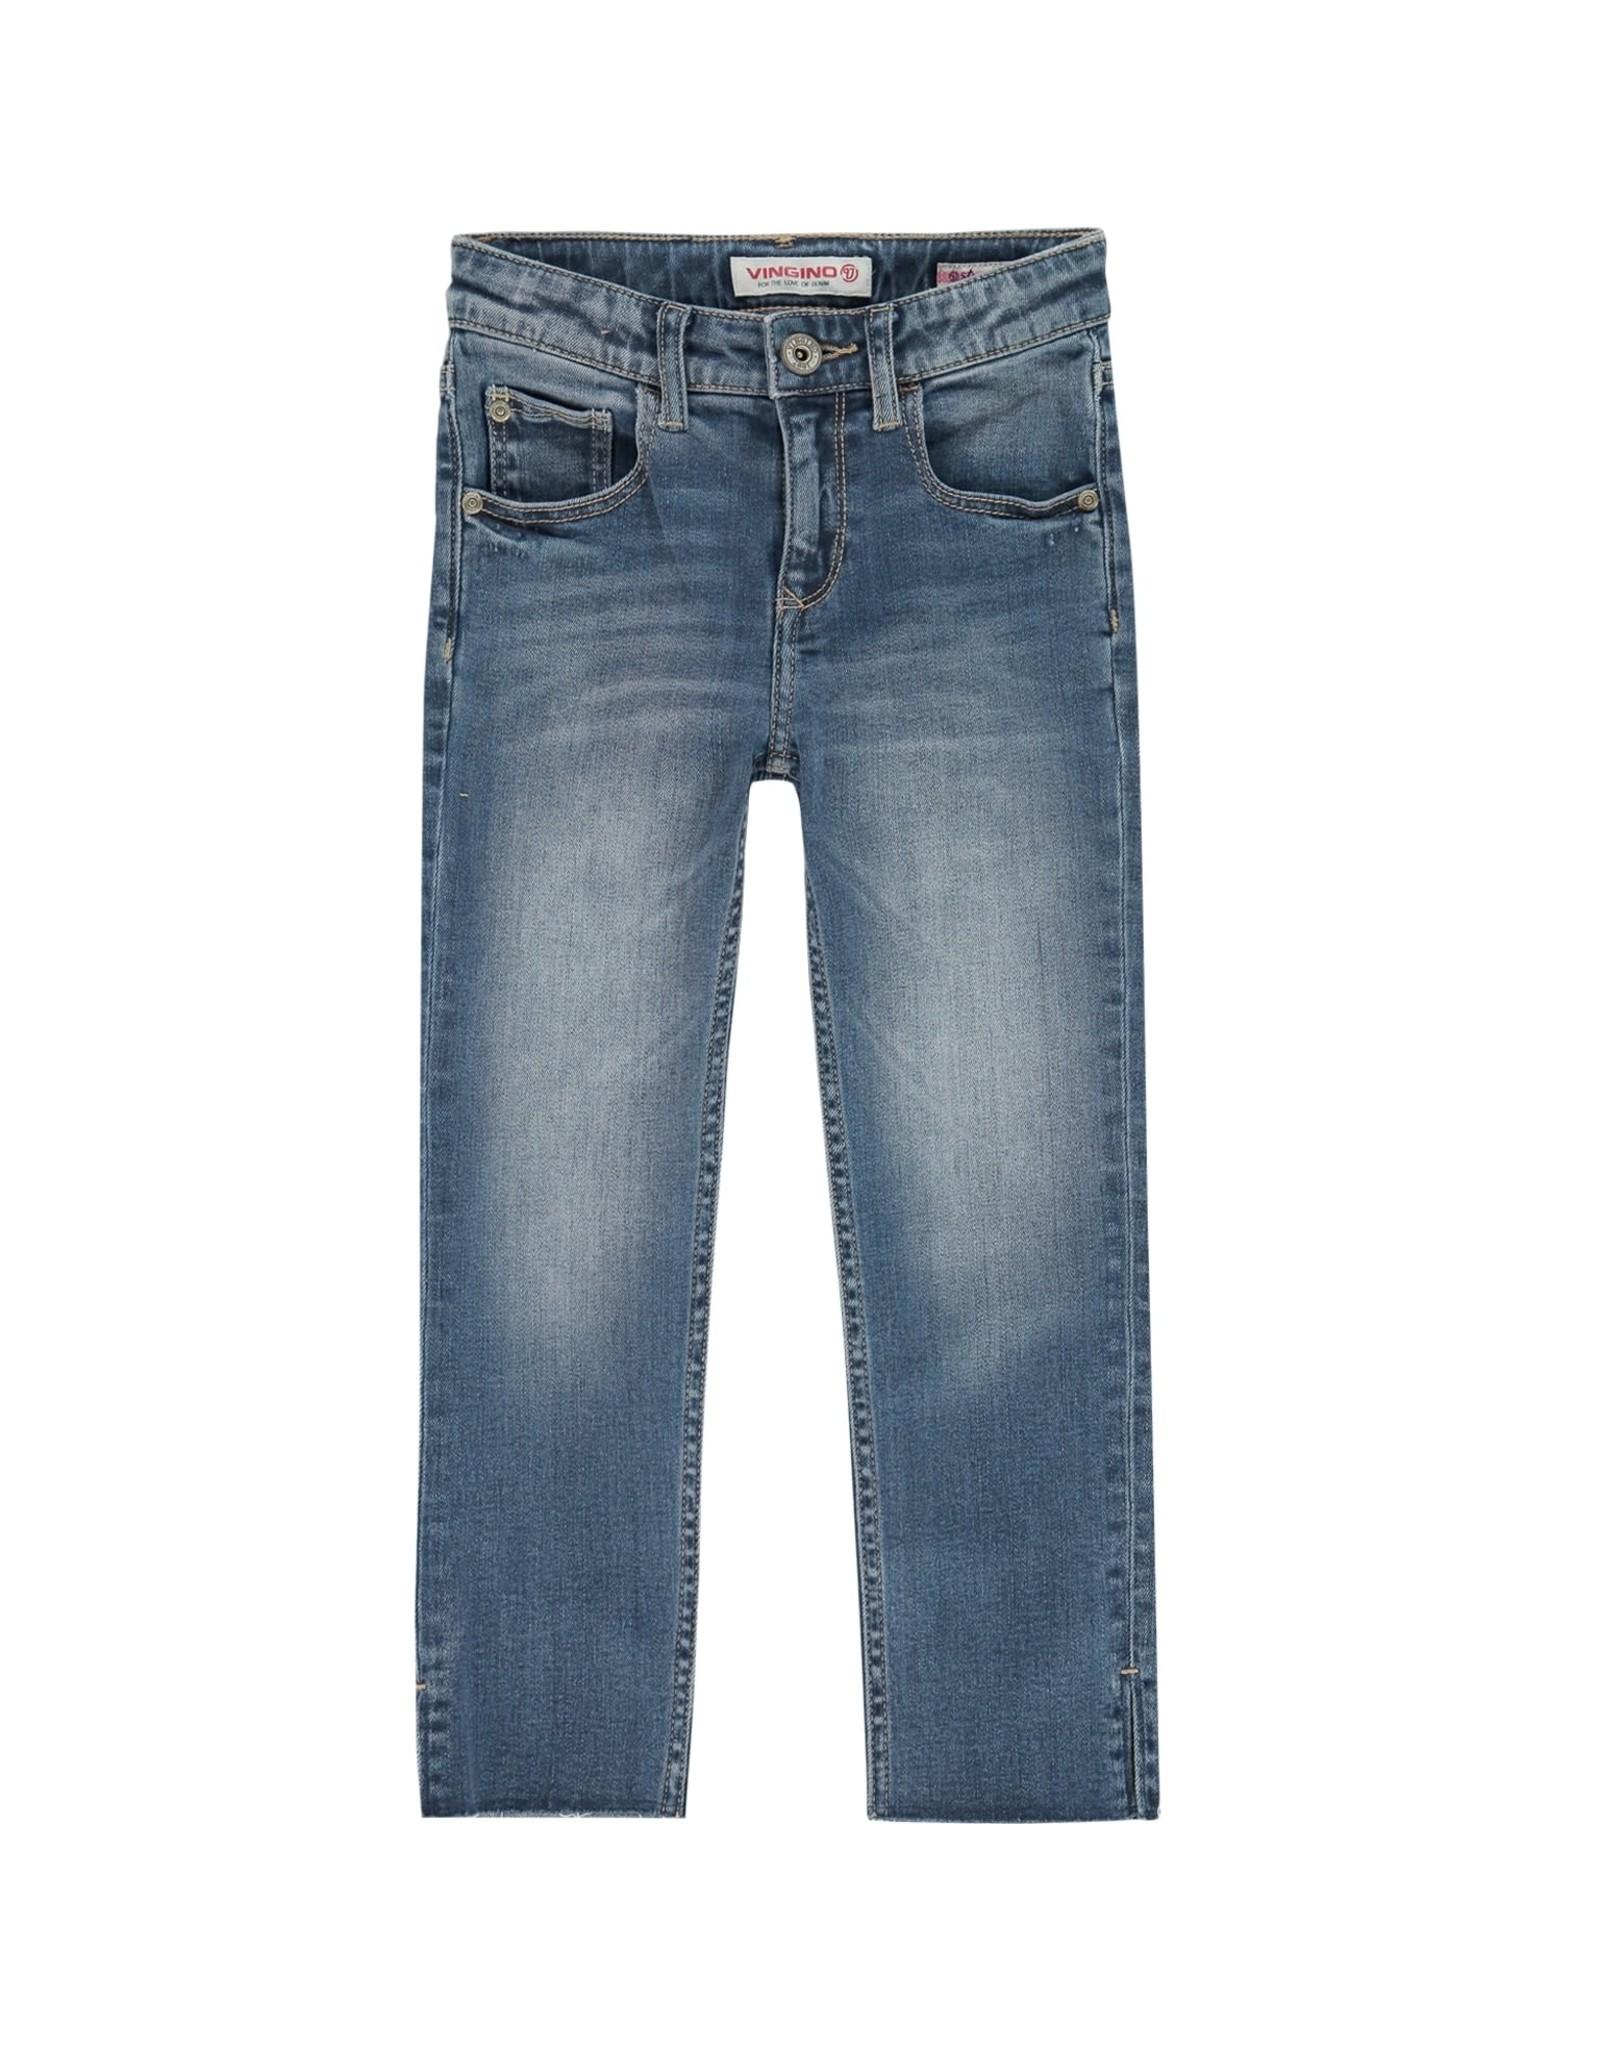 Vingino Vingino meiden Straight High Waist jeans Candy Old Vintage